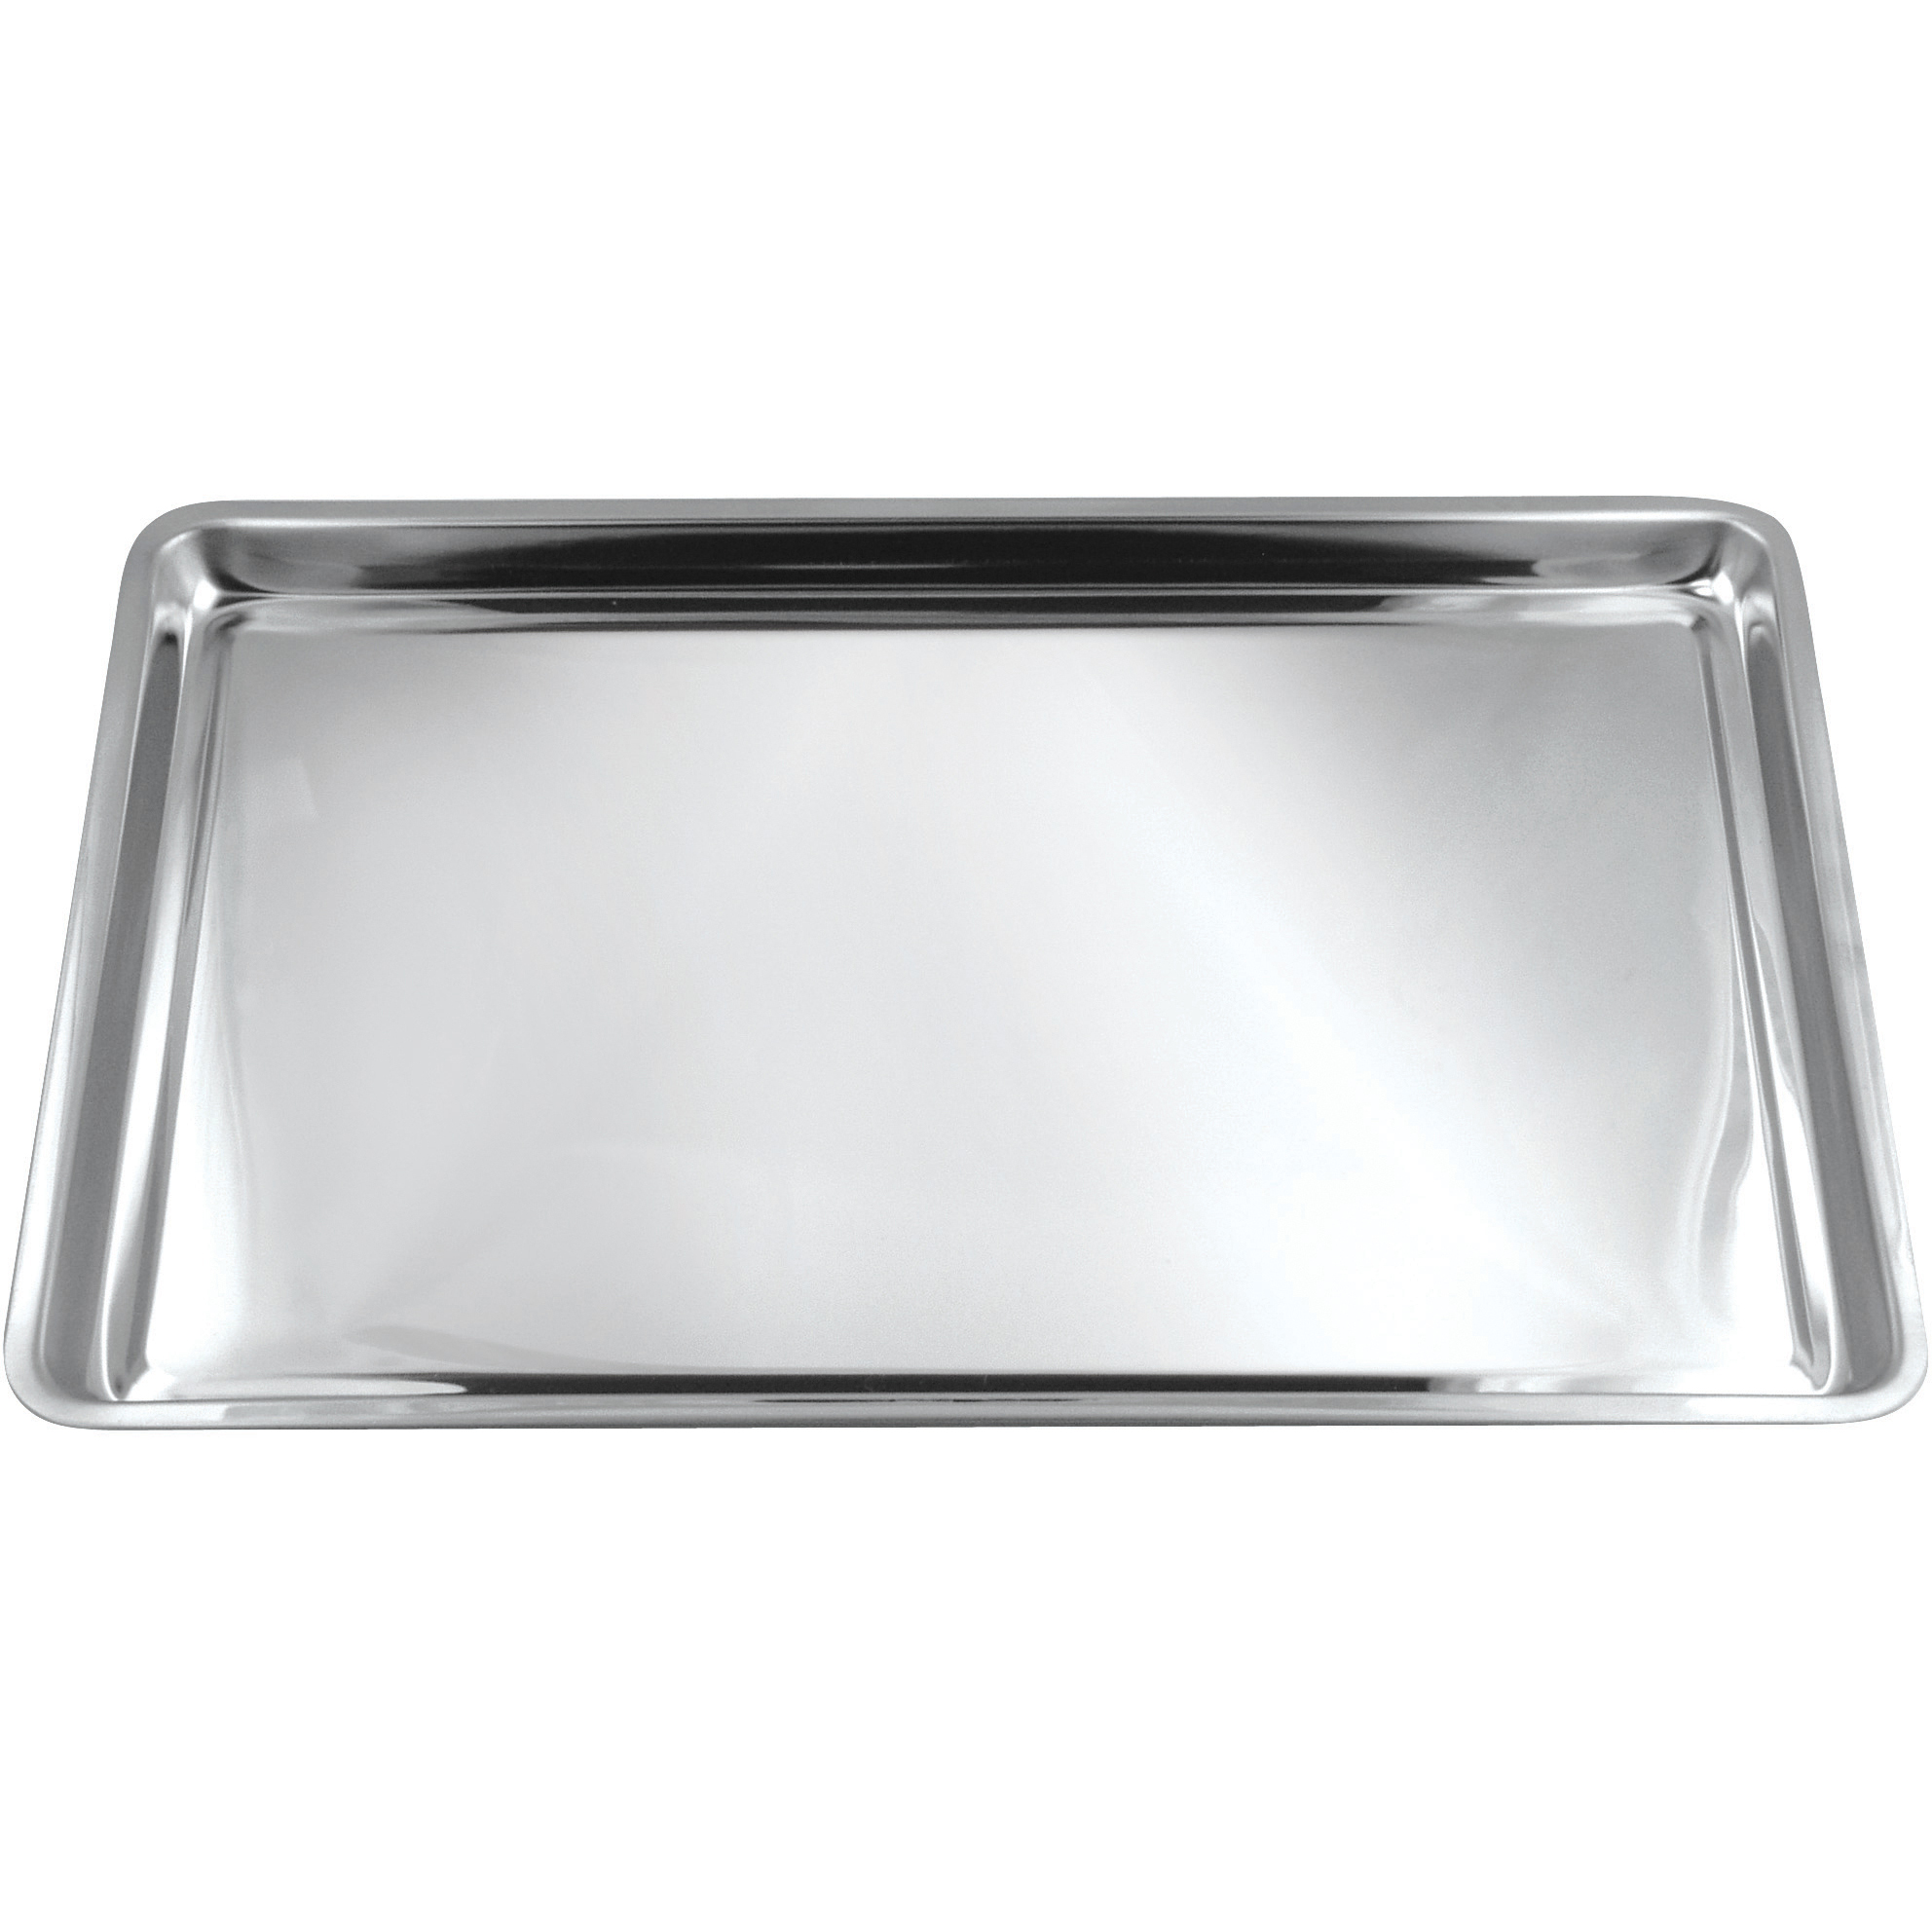 Foxrun Stainless Steel Jelly Roll Pan